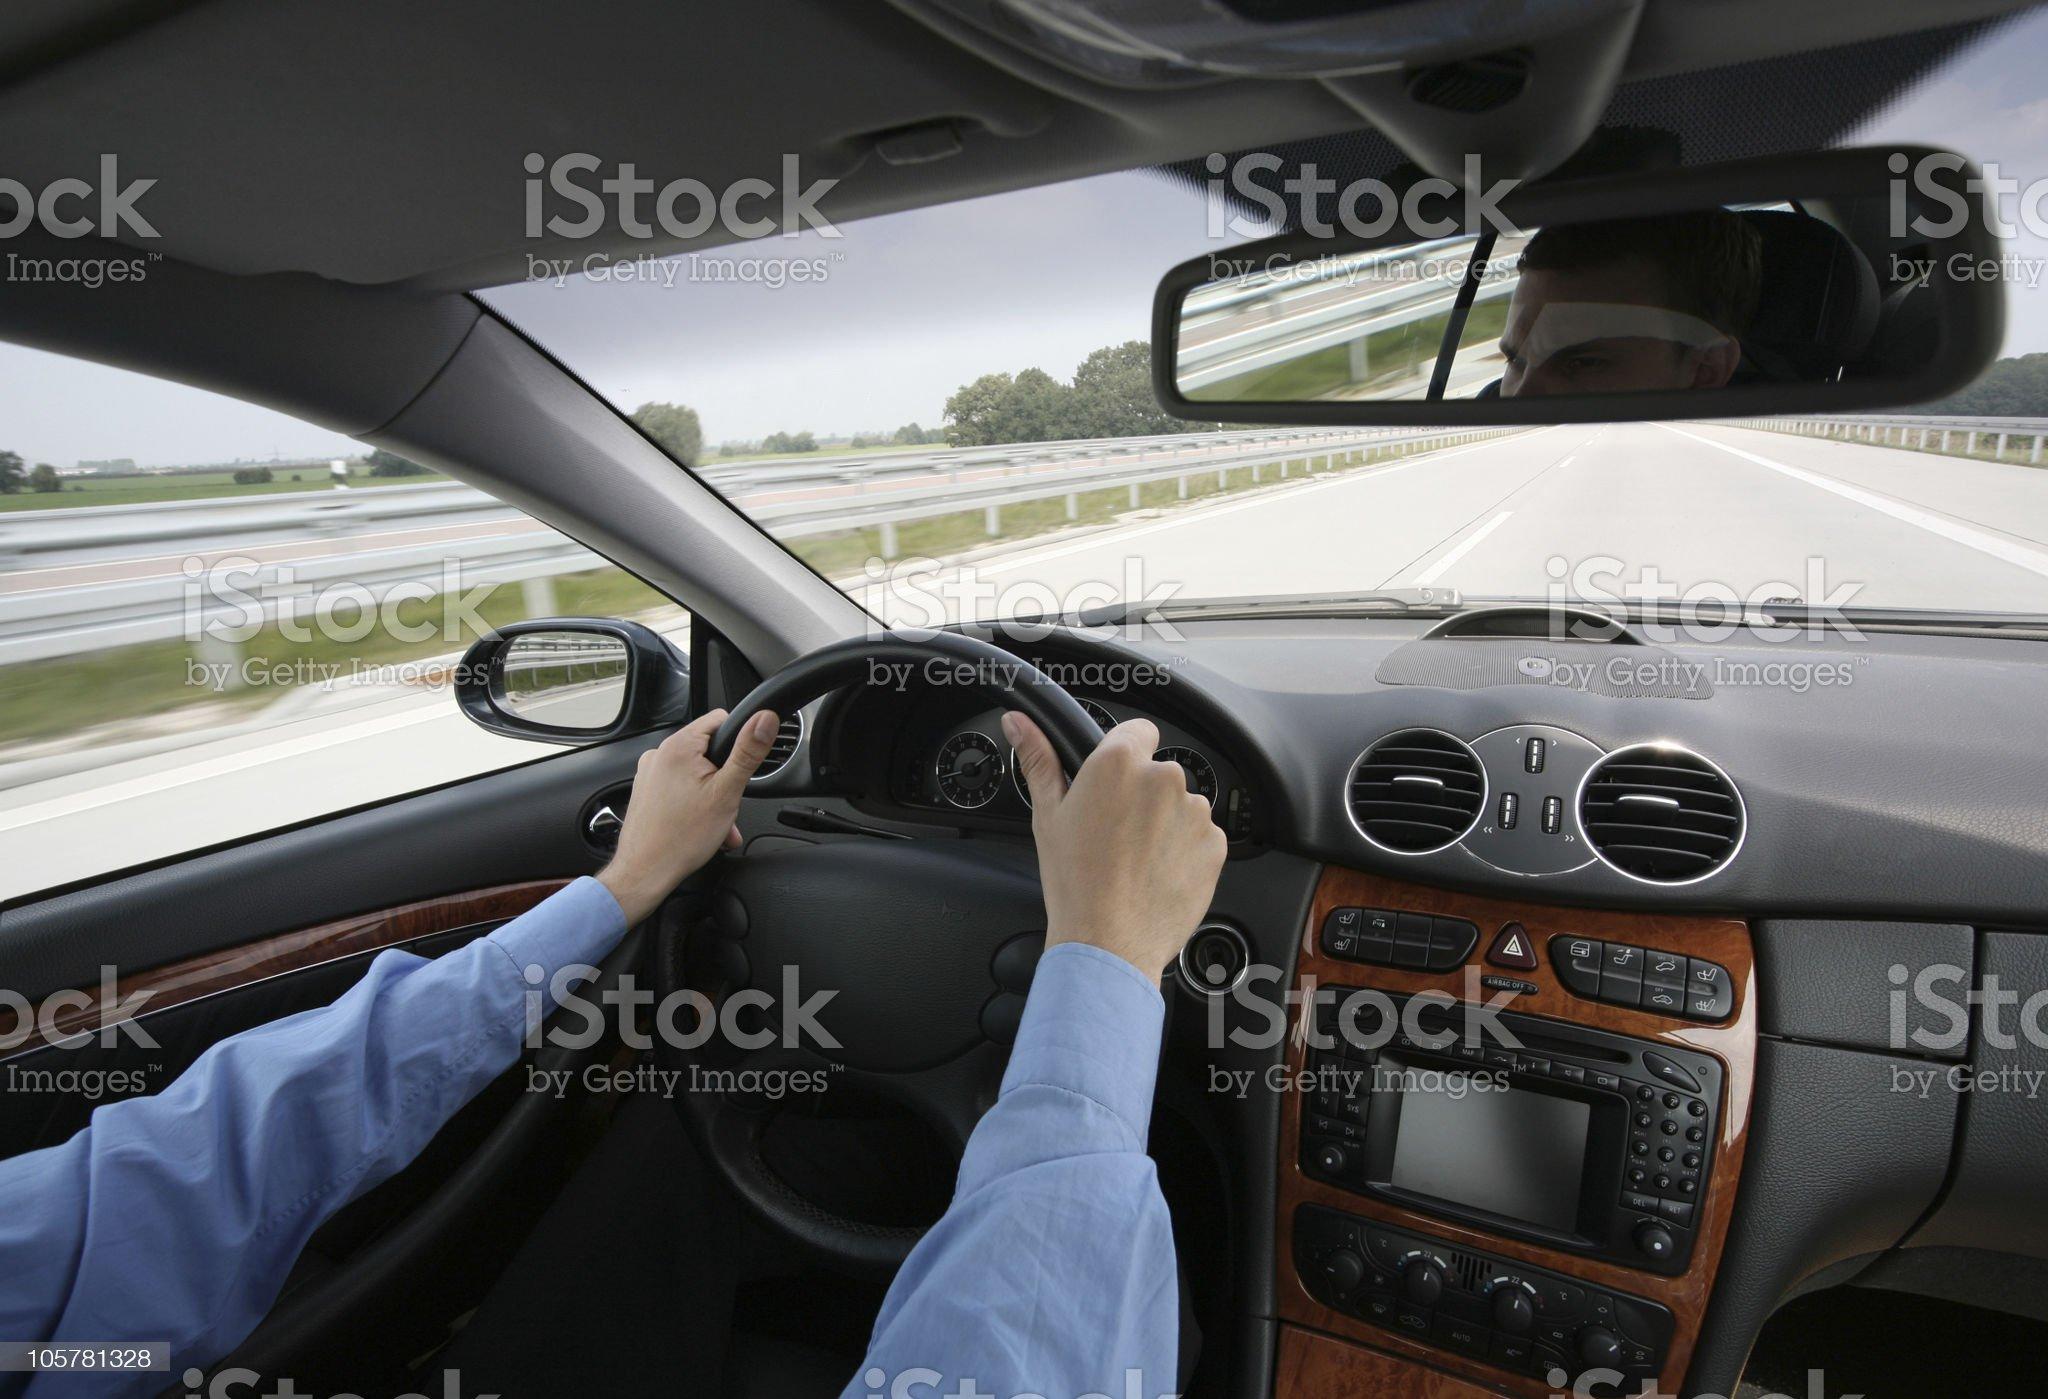 speeding on the highway royalty-free stock photo